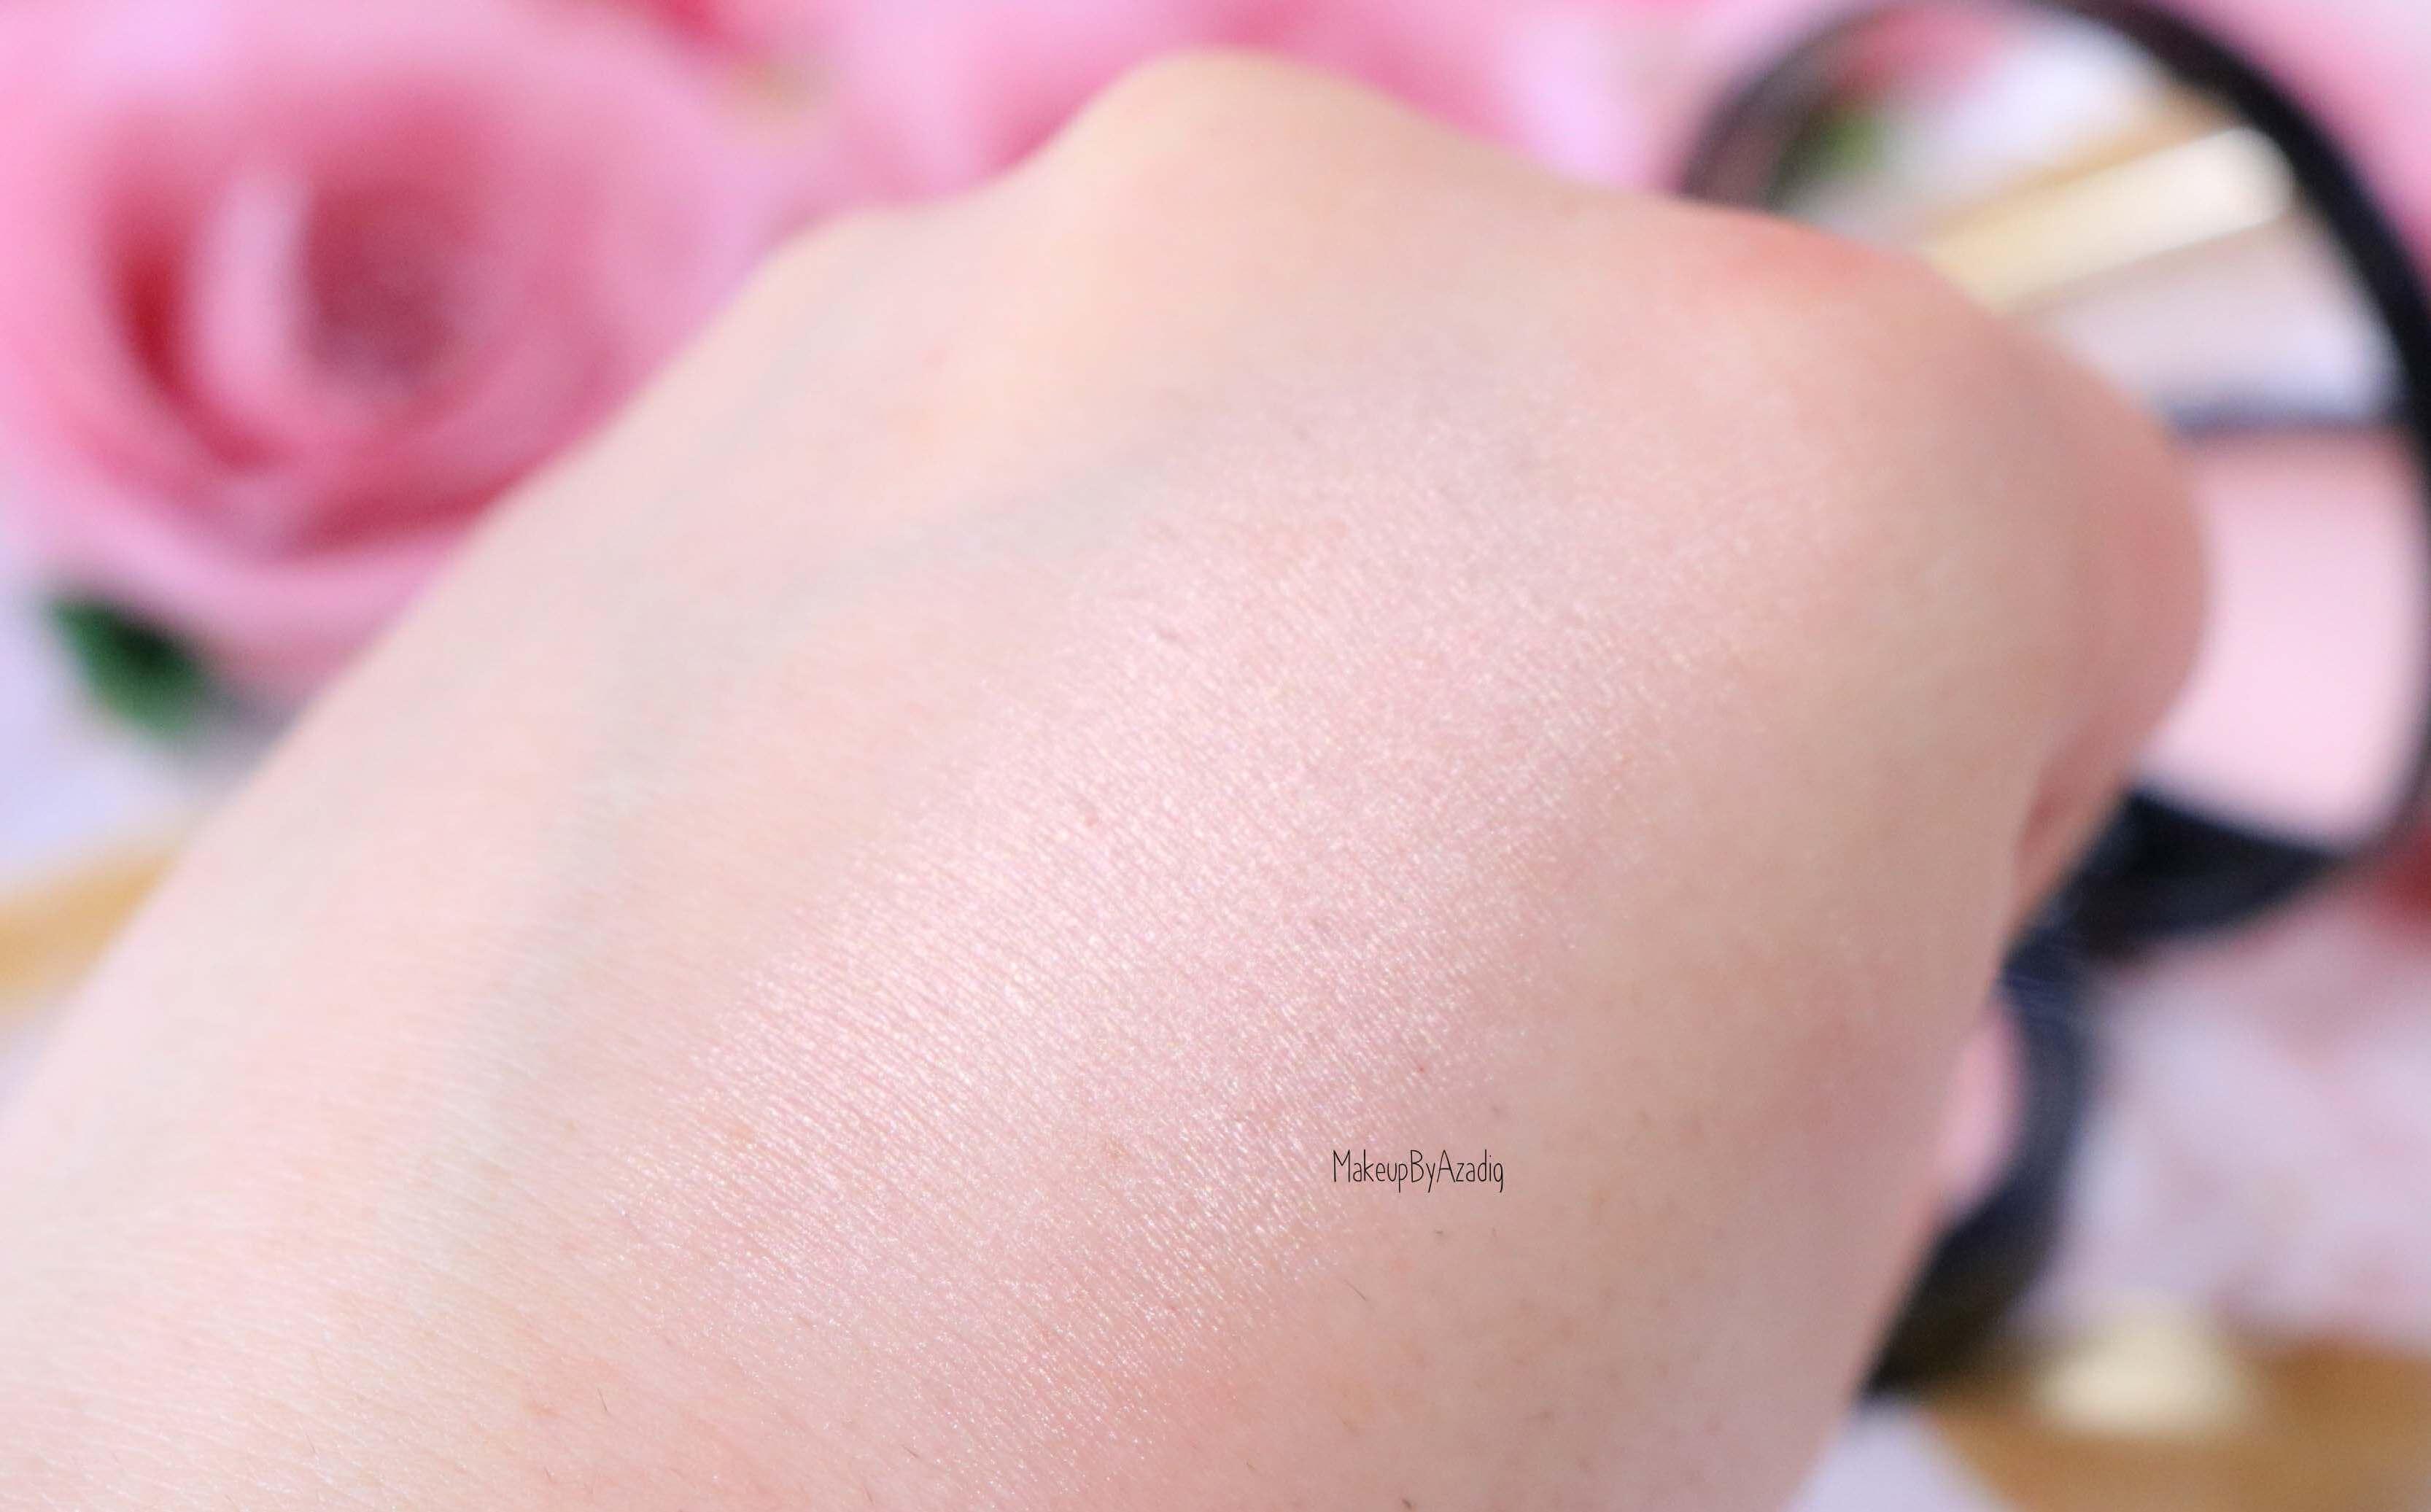 revue-highlighter-poudre-illuminatrice-golden-hour-dusk-sephora-collection-rosegold-avis-prix-swatch-makeupbyazadig-flop